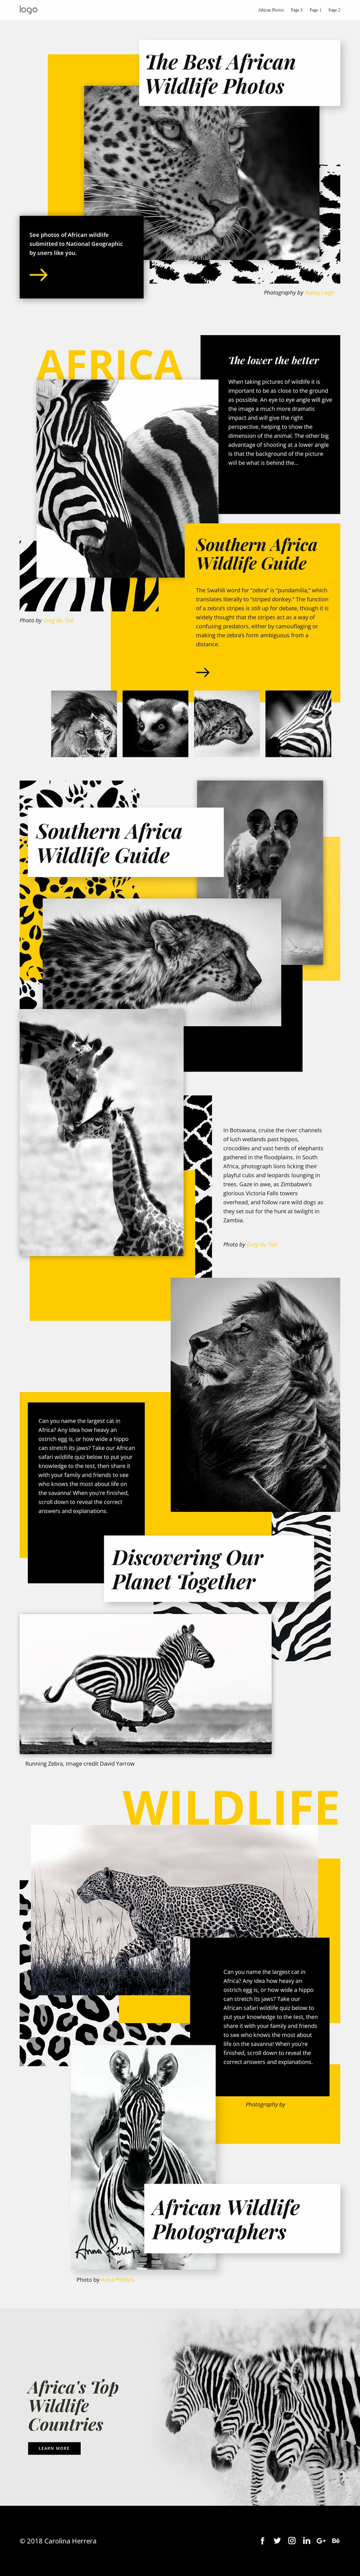 Best African Photos WordPress Website Builder